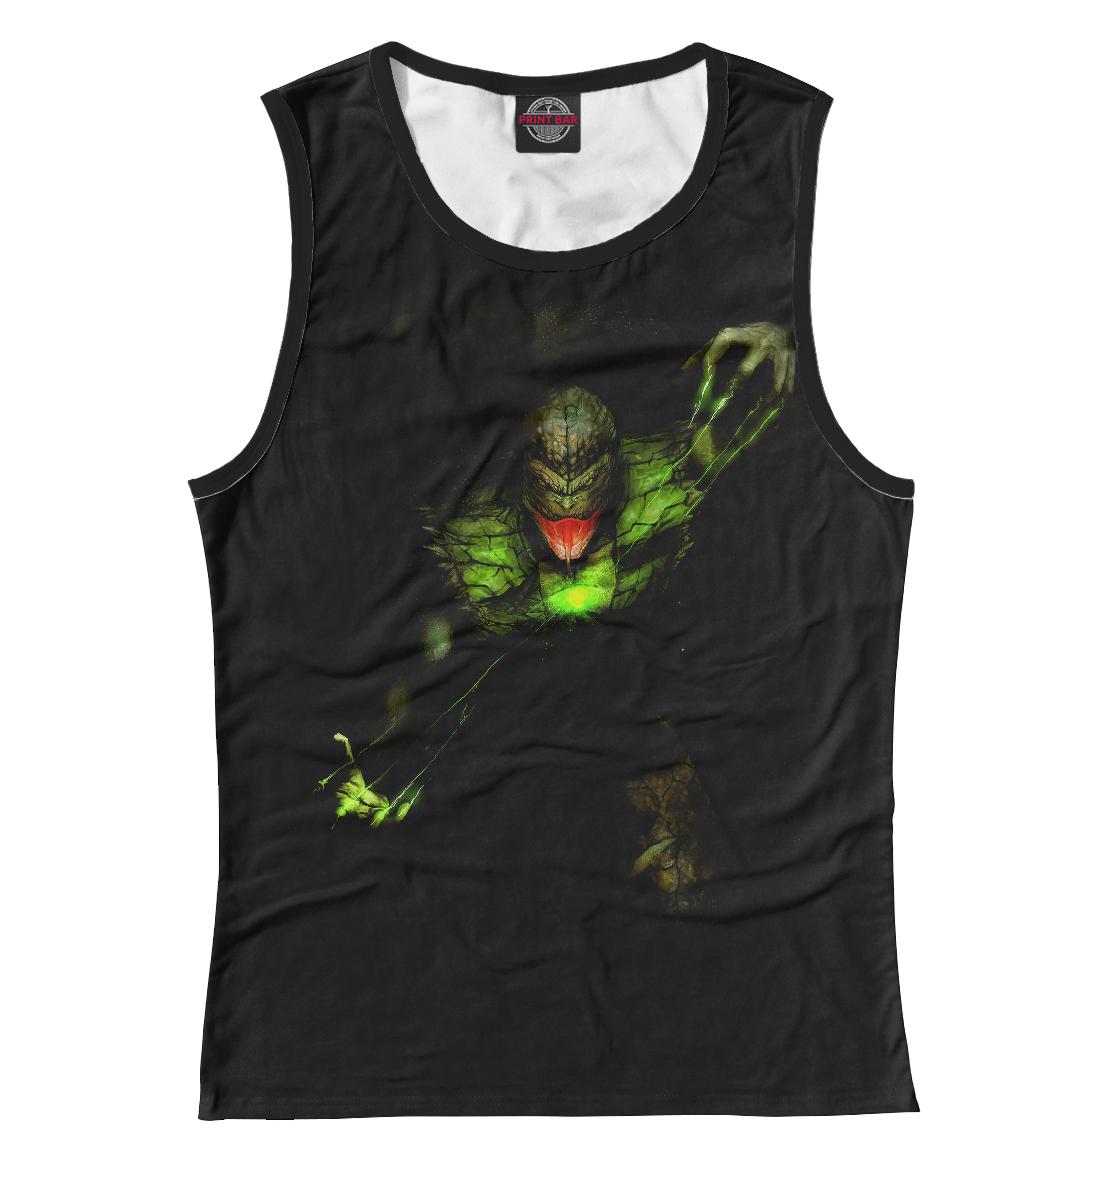 Купить Reptile, Printbar, Майки, MKB-843565-may-1